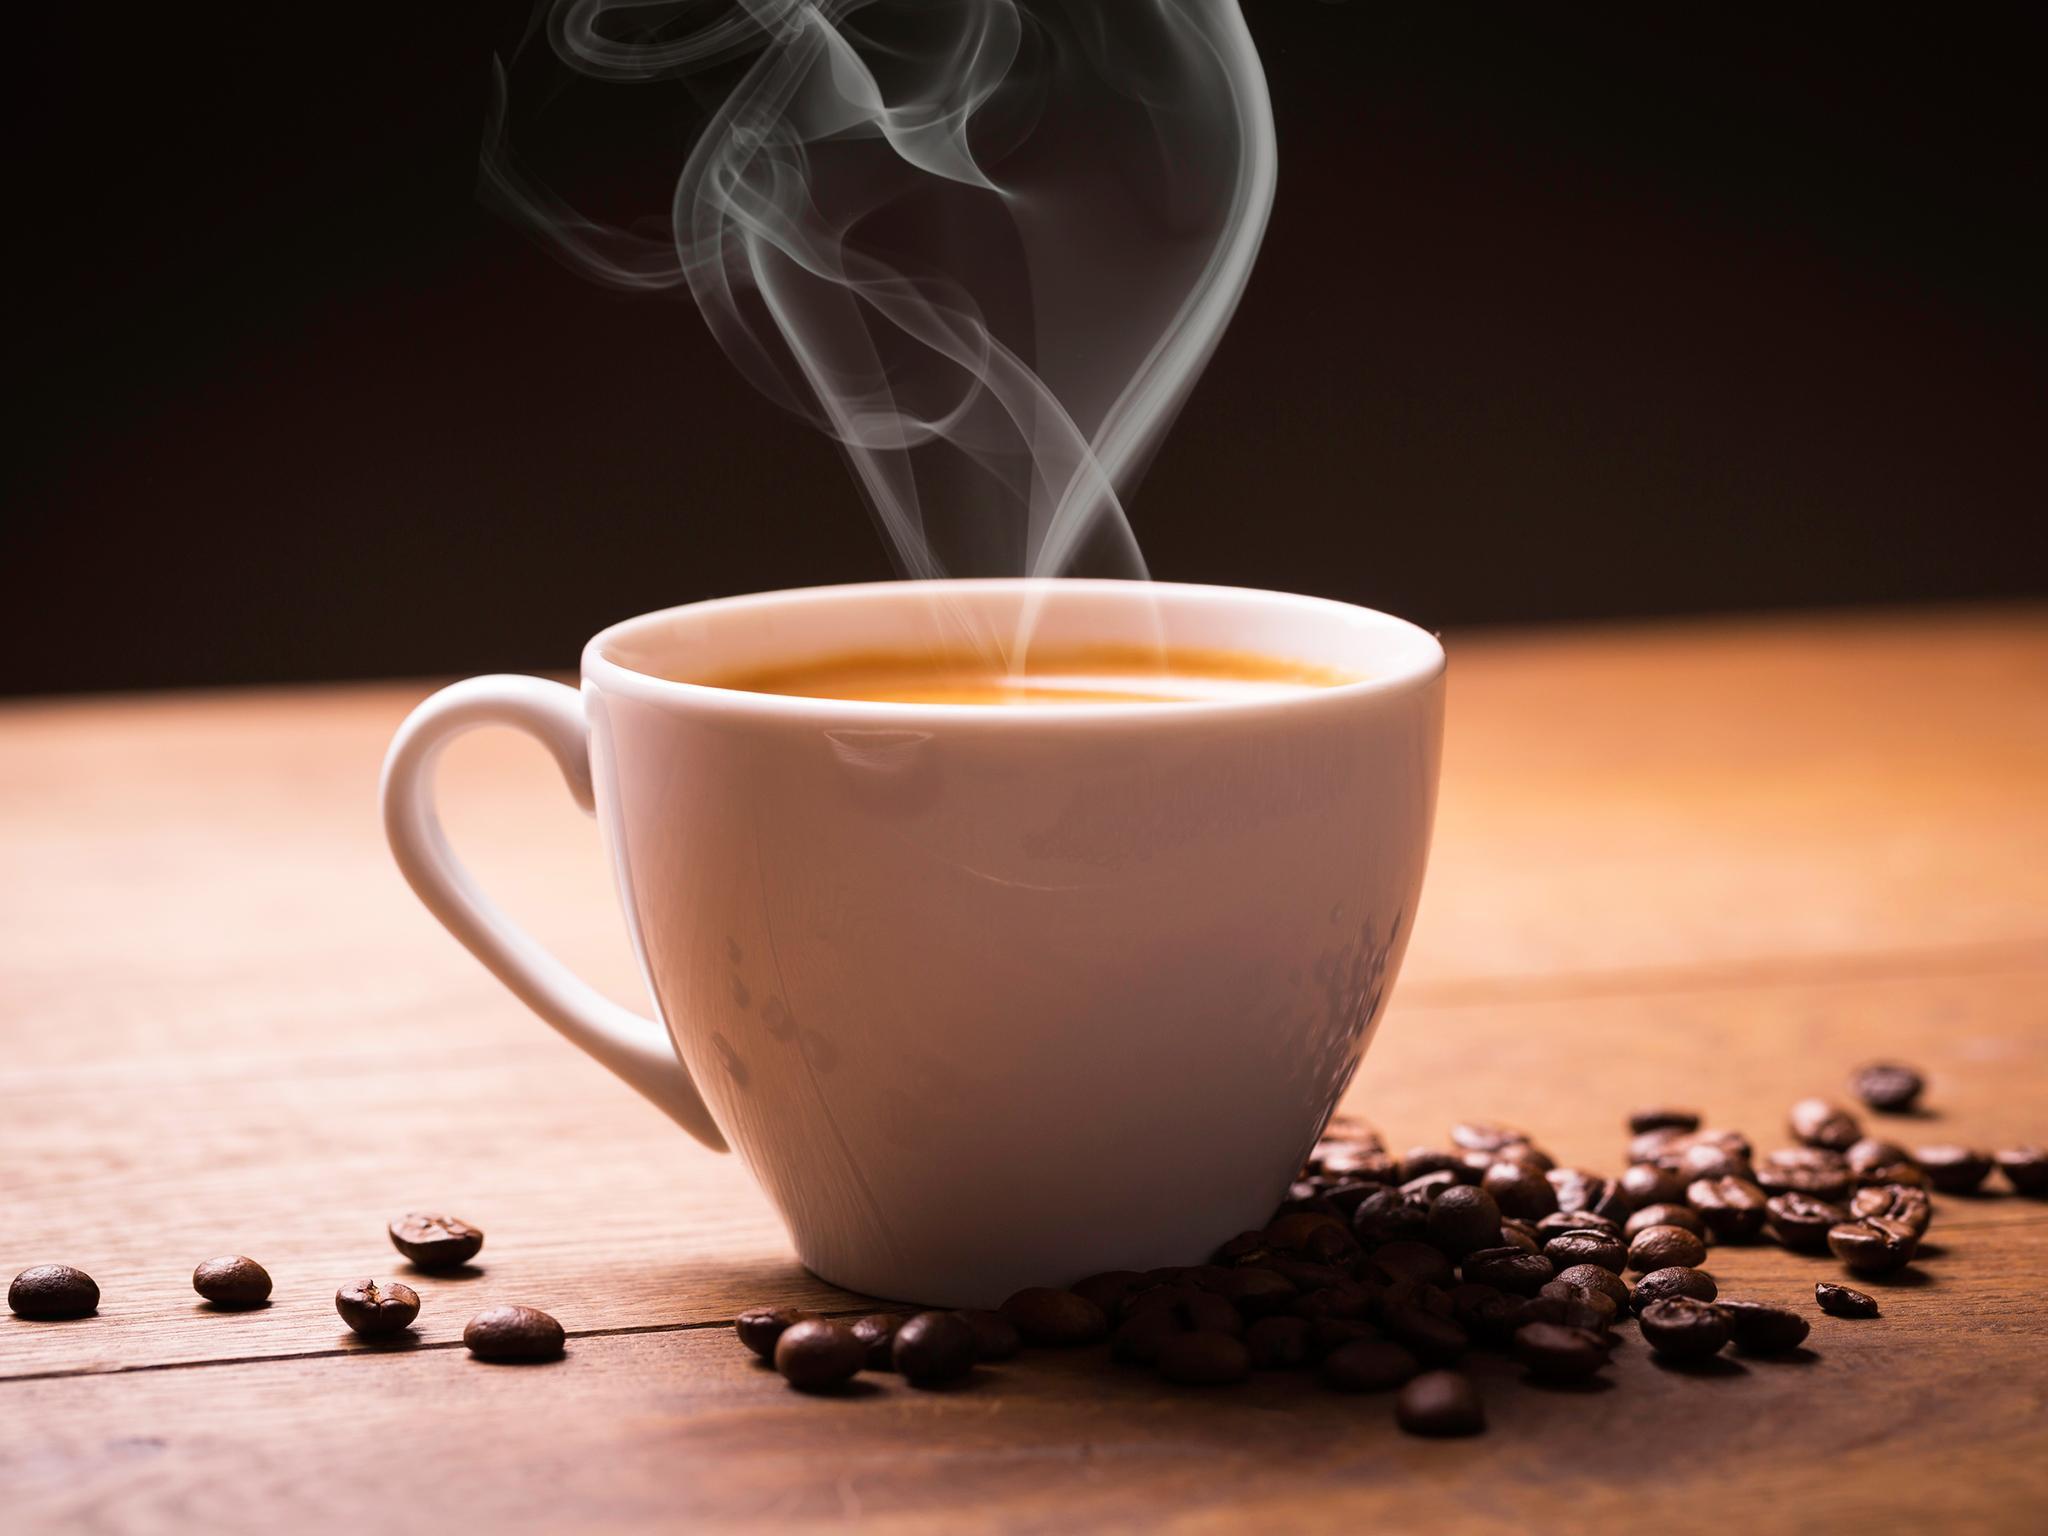 Pp hot coffee rf istock